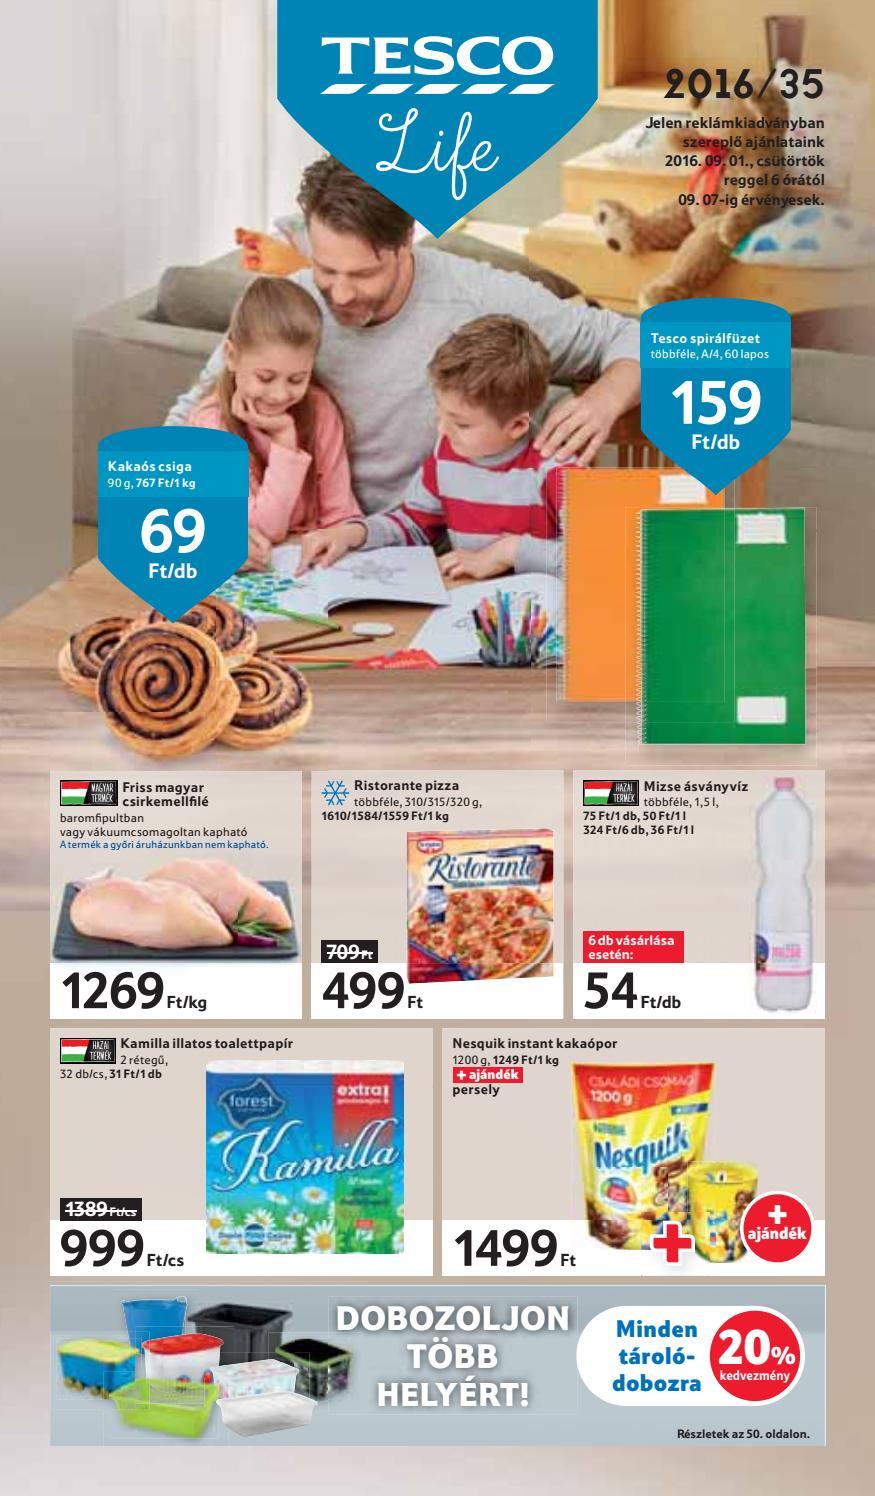 Tesco hipermarket reklamujsag 20160901 by myhungary.net - issuu e95960578b